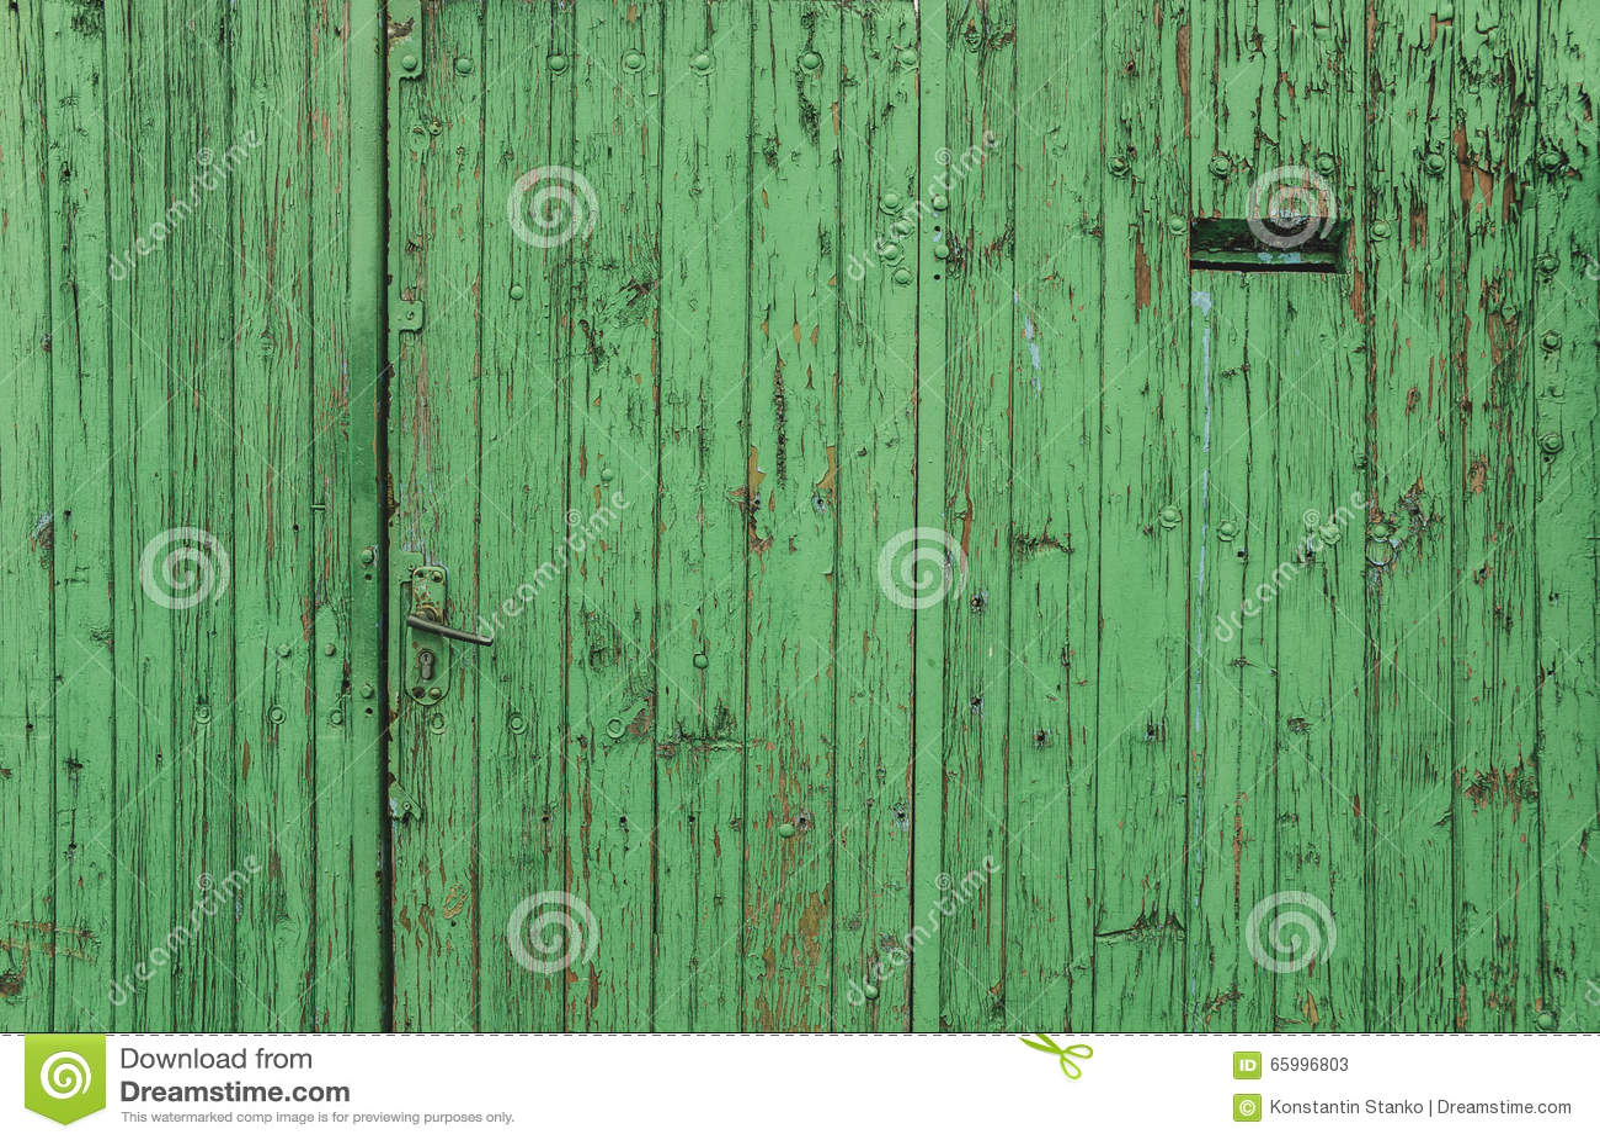 alte tür verkleidet als grüner zaun stockbild - bild von auszug